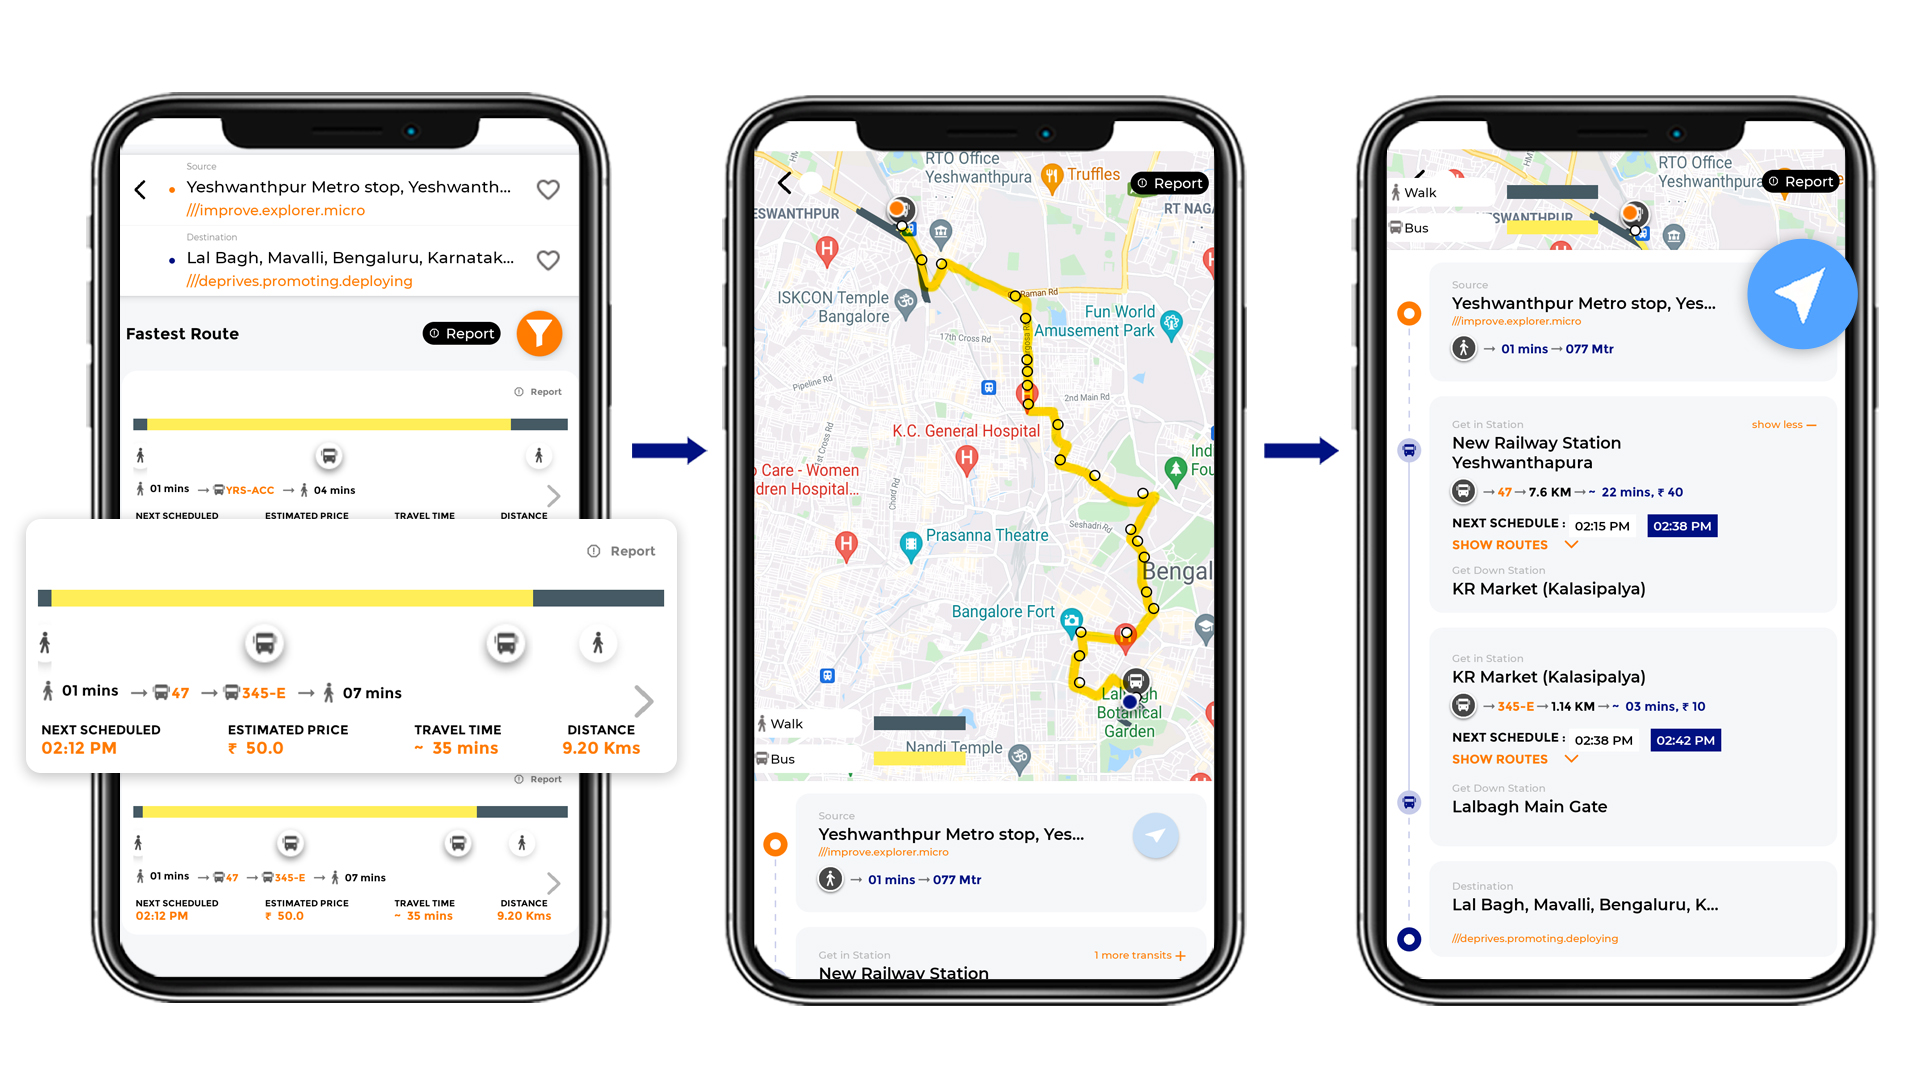 Tummoc, Tummoc app, Public transport,Lal Bagh, Yeshwantpur